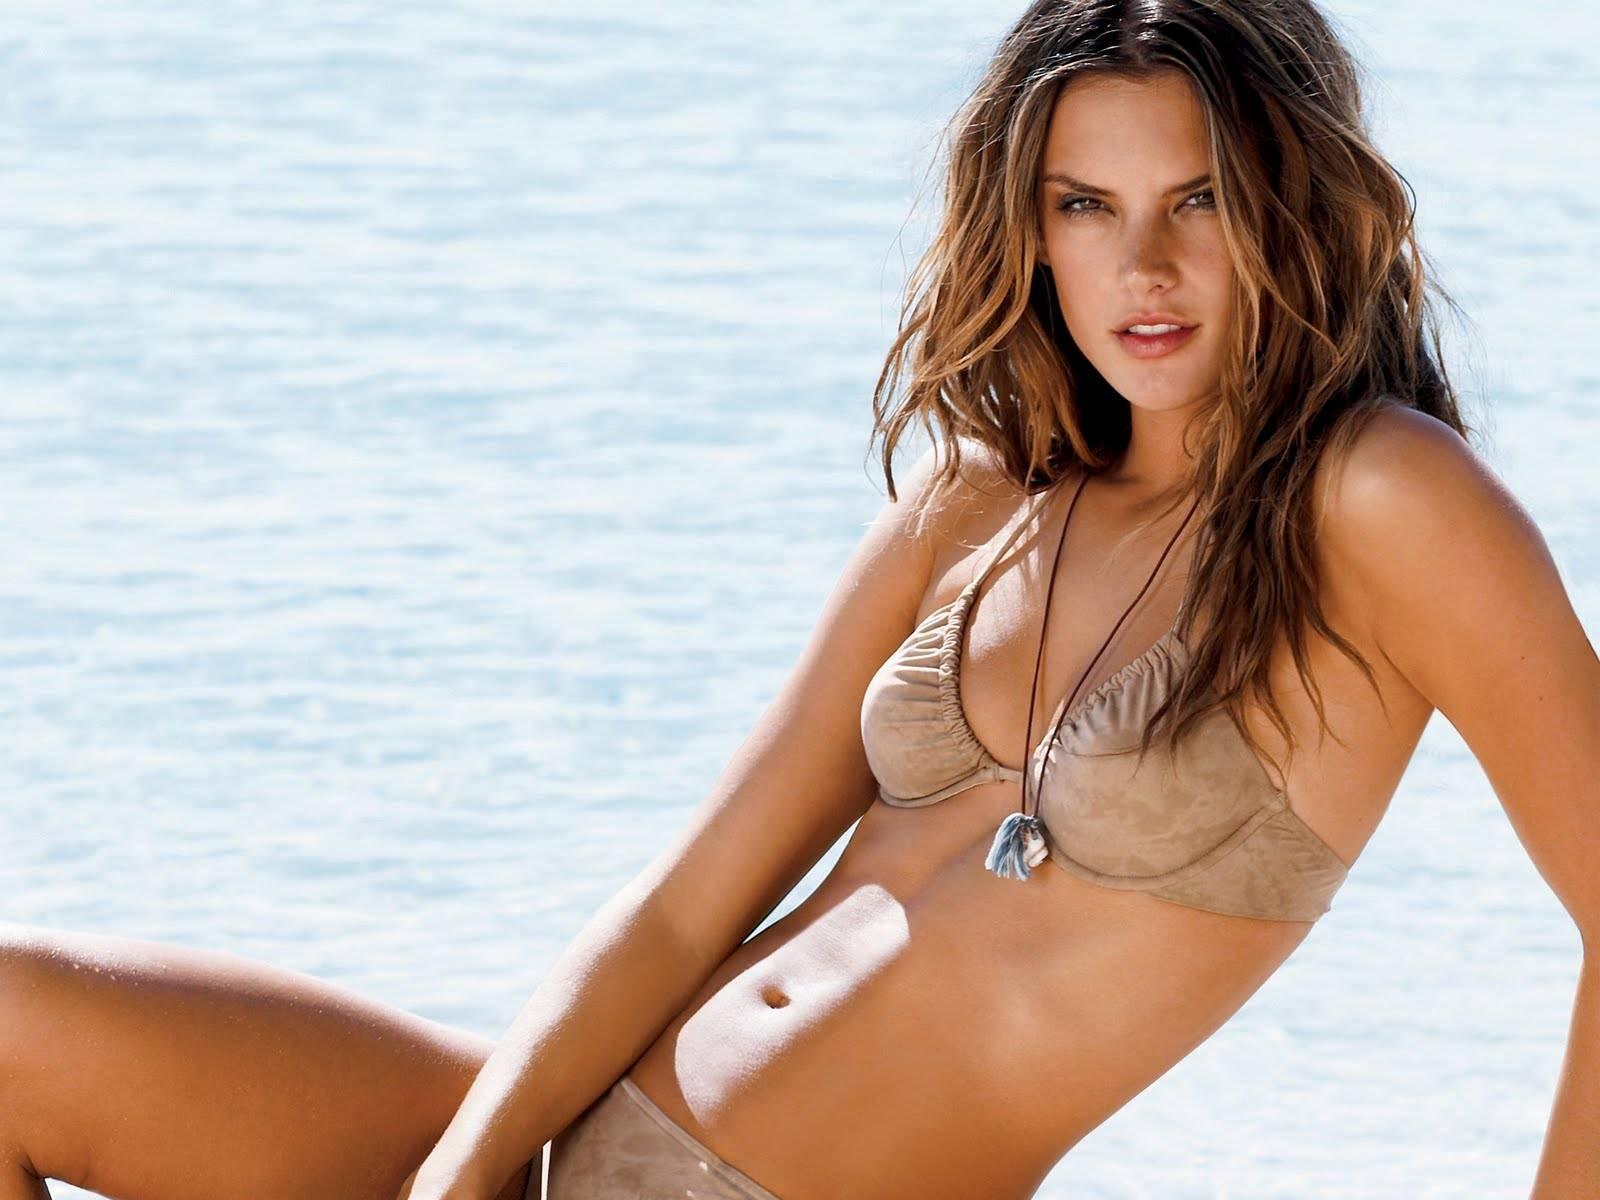 http://4.bp.blogspot.com/-MX1cZv9y5_0/T3z3bTzielI/AAAAAAAAQ48/H--Hsf2ZlJw/s1600/Alessandra+Ambrosio+Hot.jpg